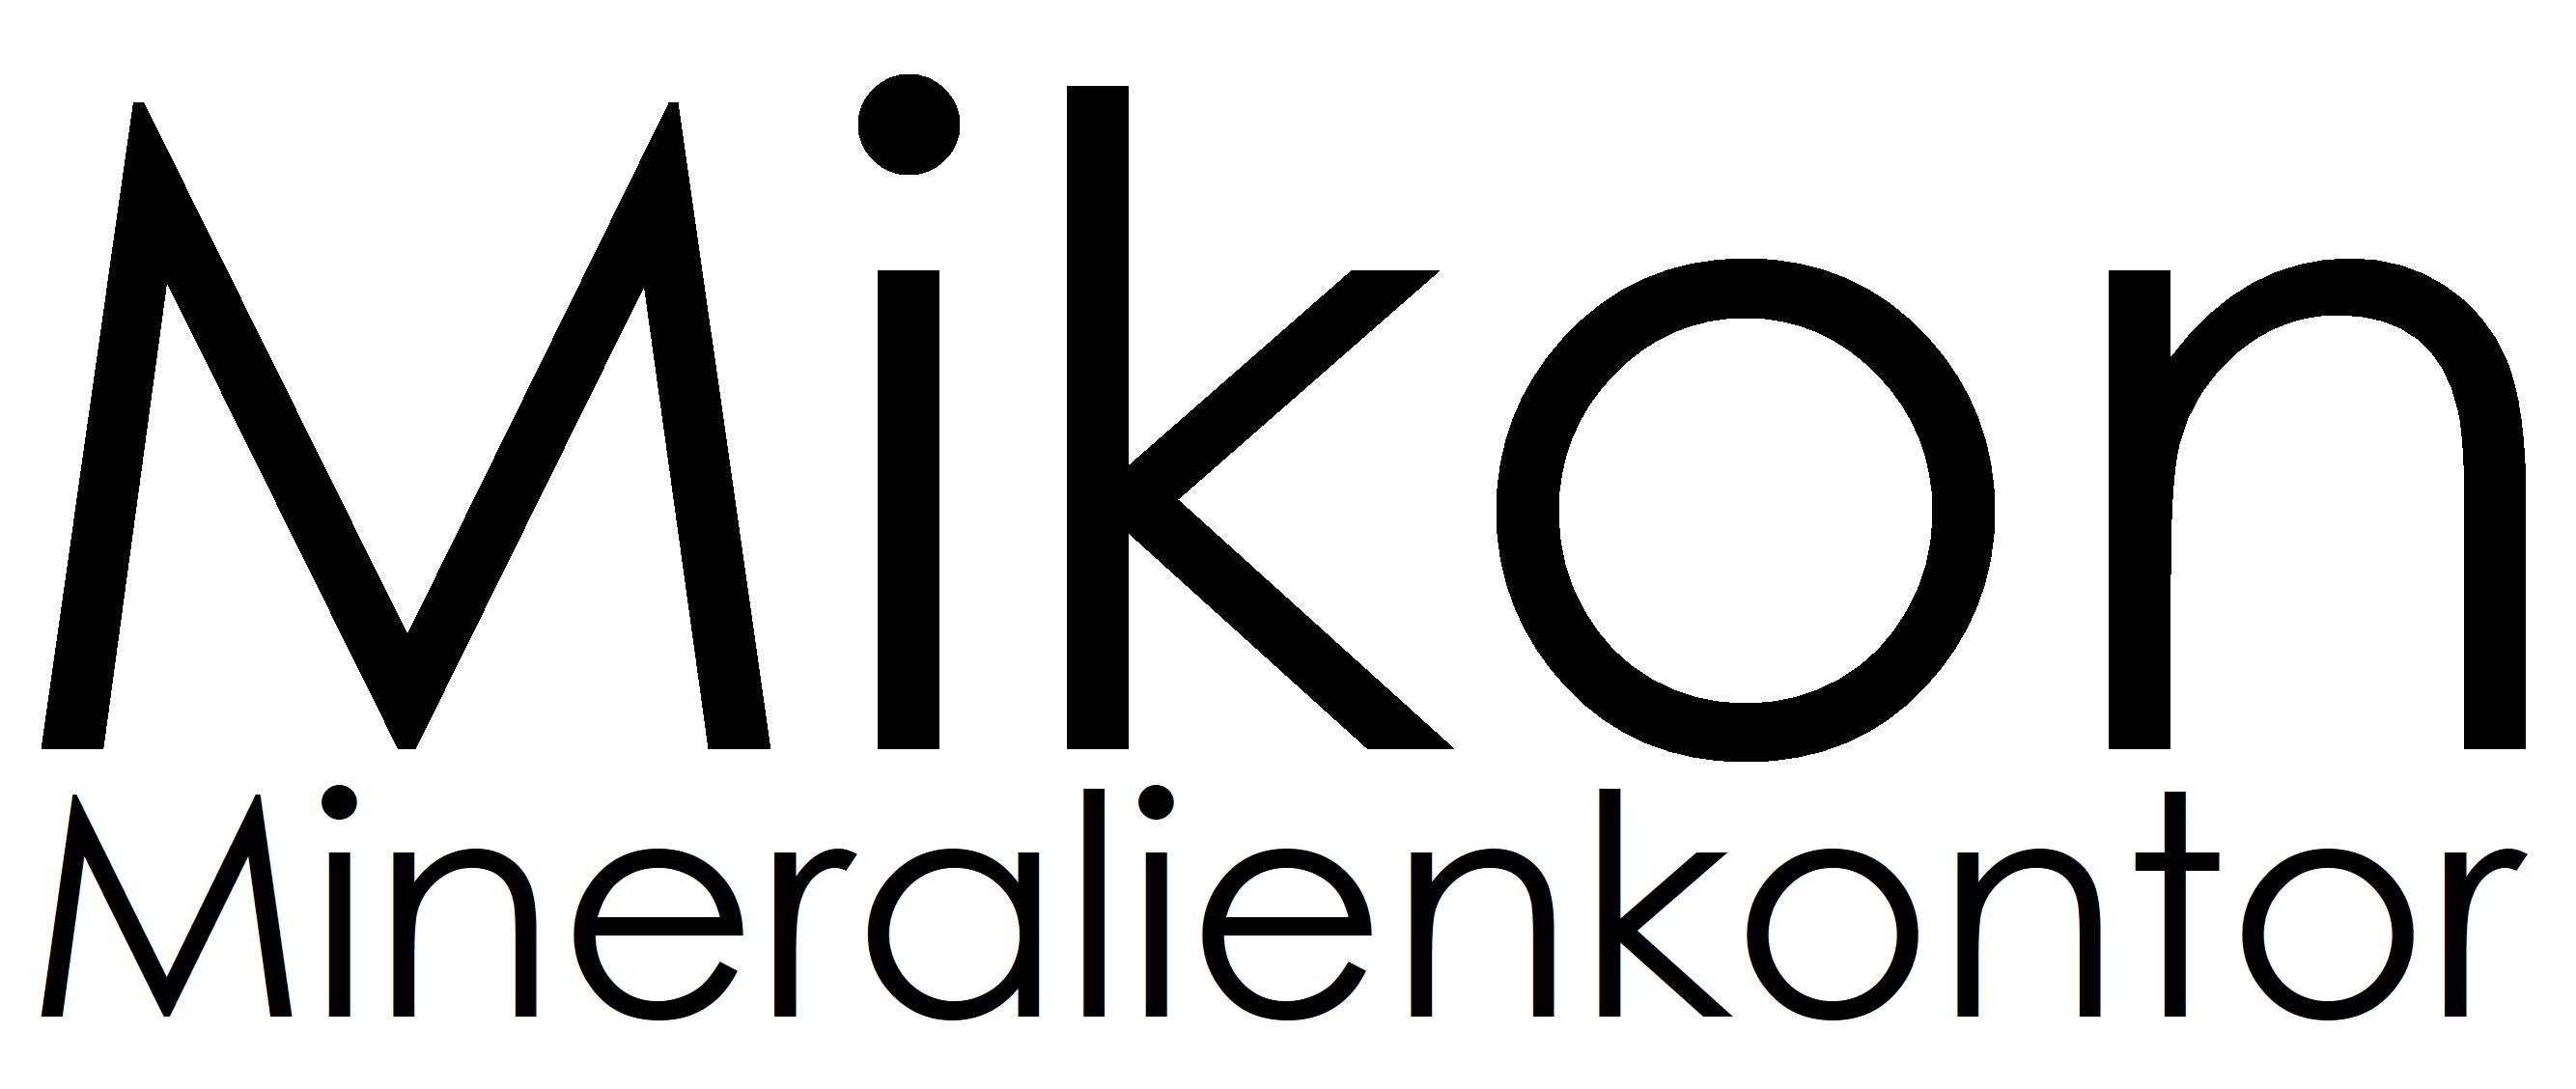 Mikon Mineralienkontor Logo